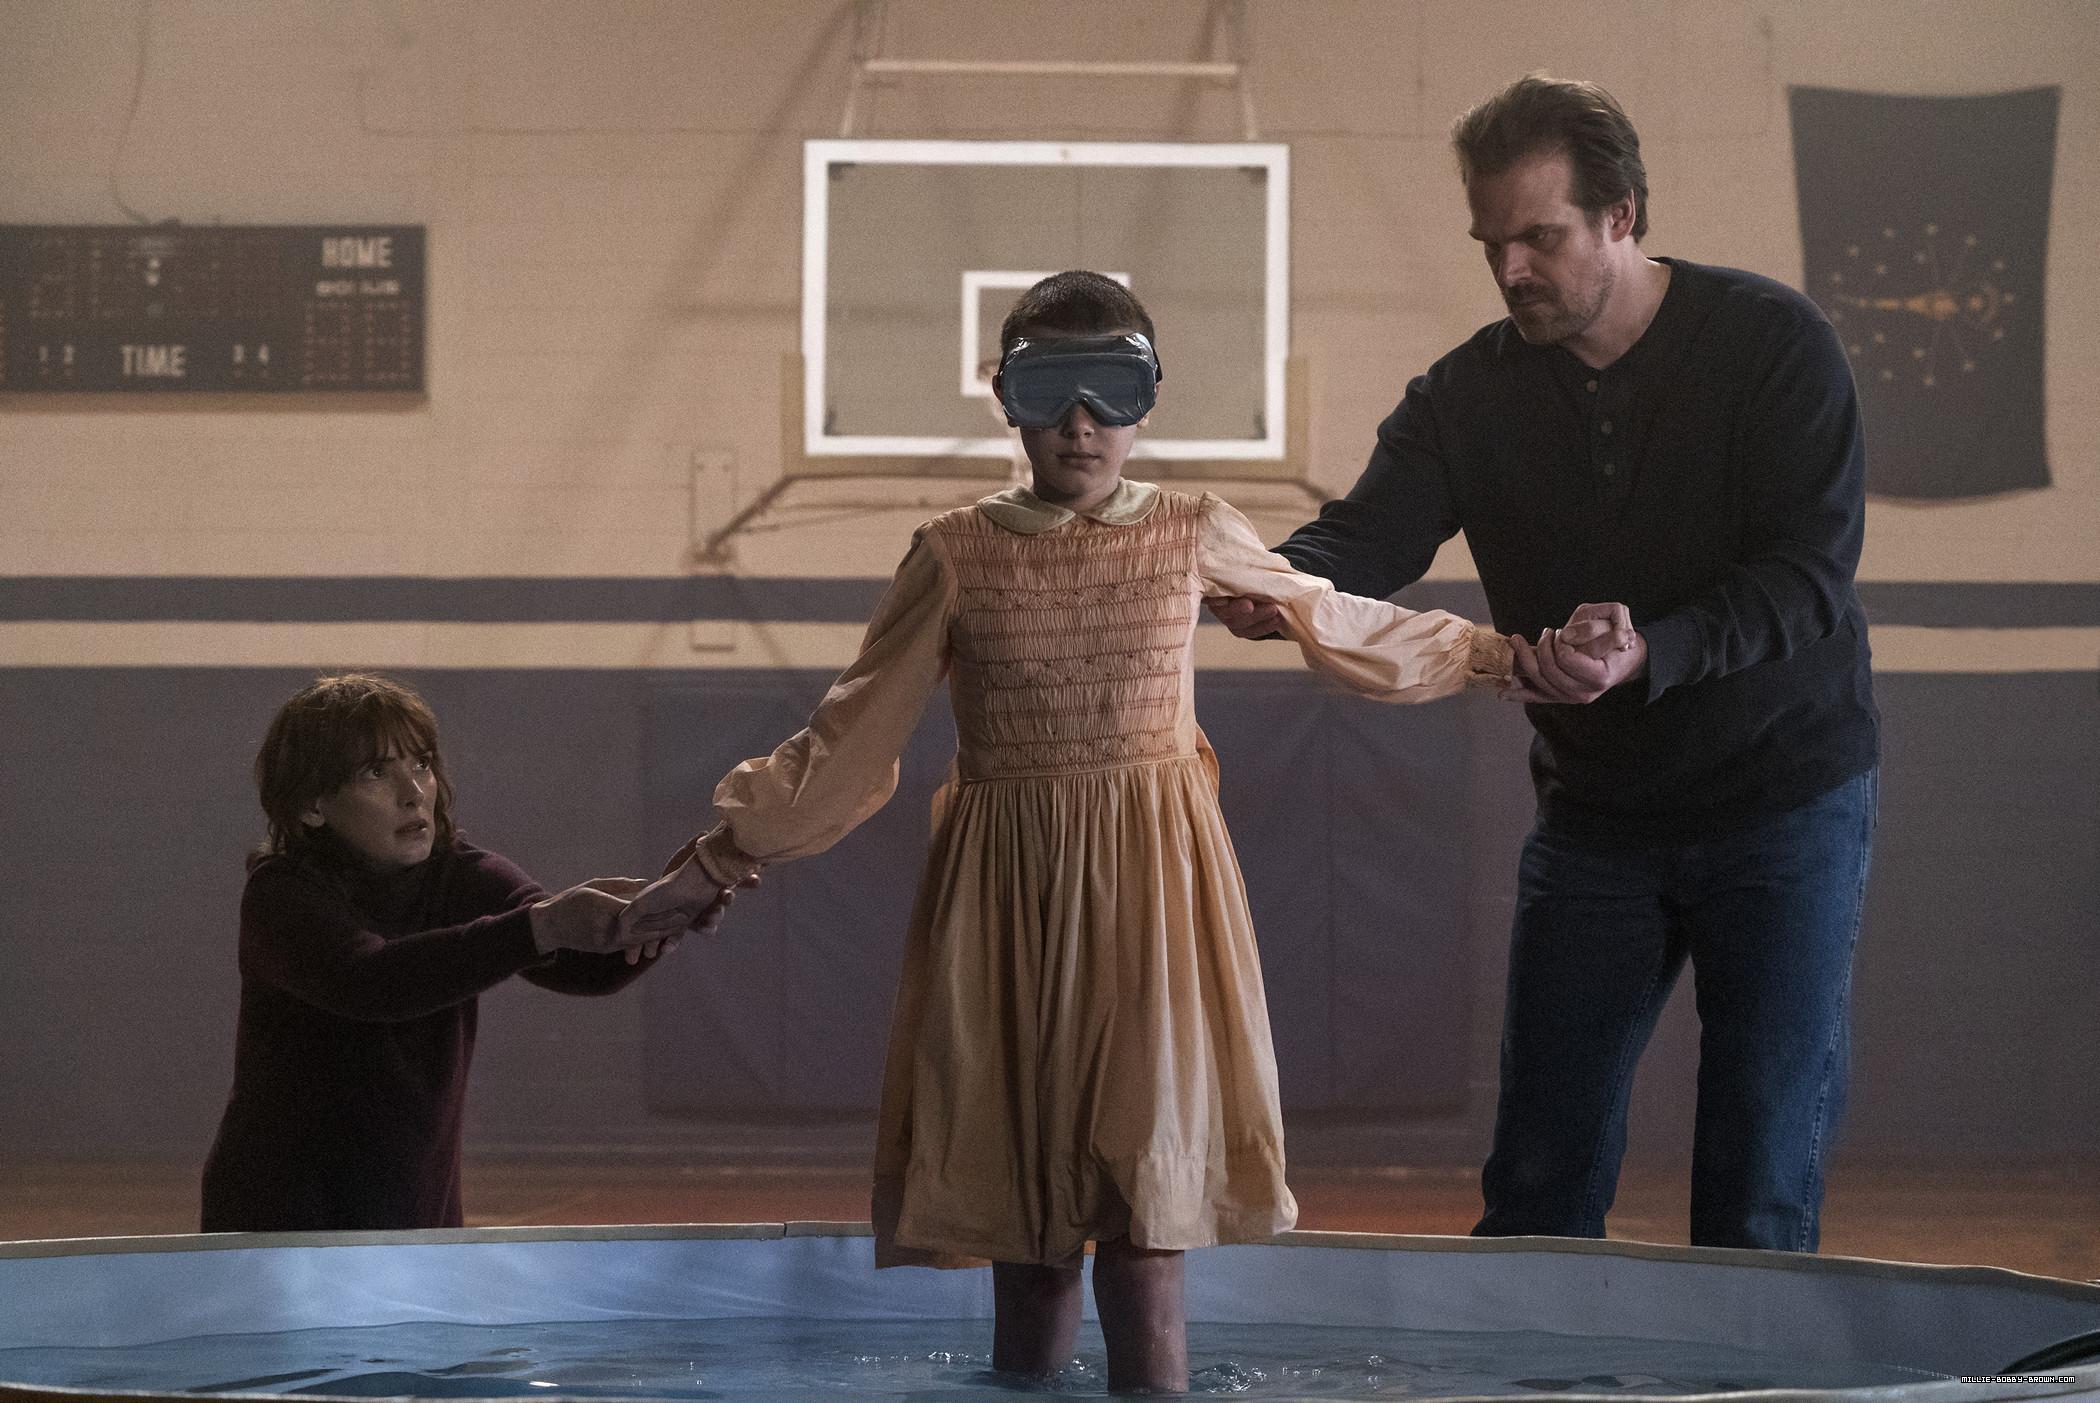 Mejores episodios de Stranger Things - 1x07